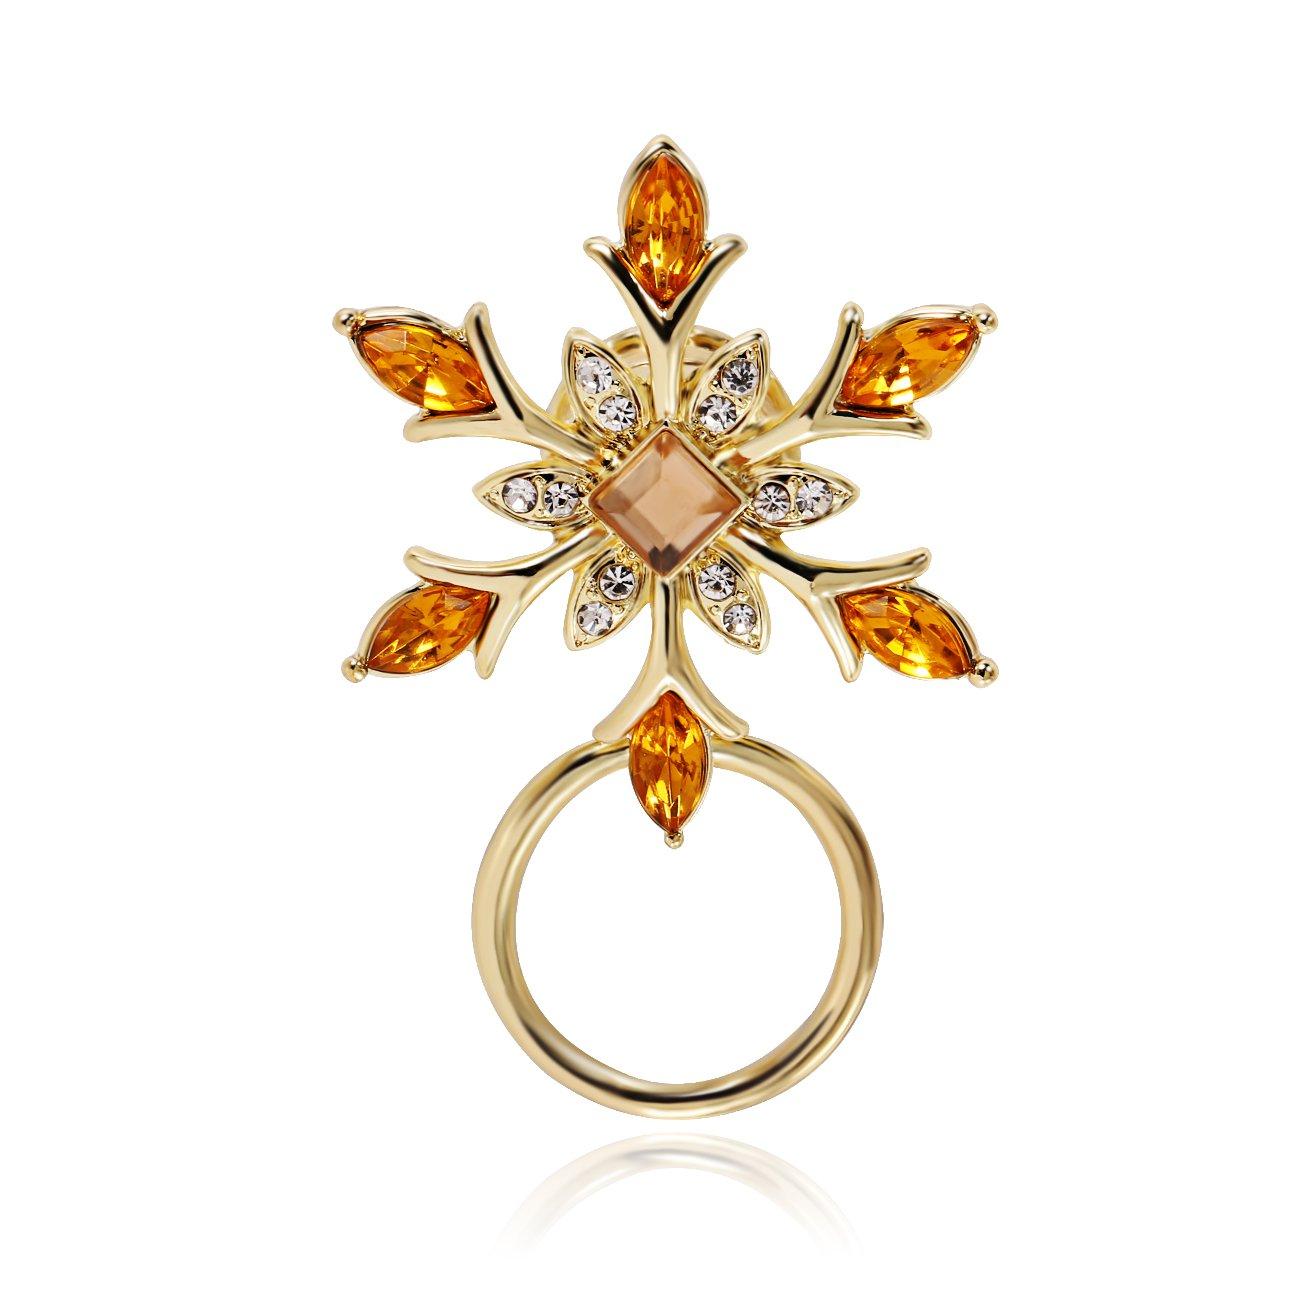 PANGRUI Winter Holiday Snowflake Flower Brooch Magnetic Eyeglasses Holder (gold)